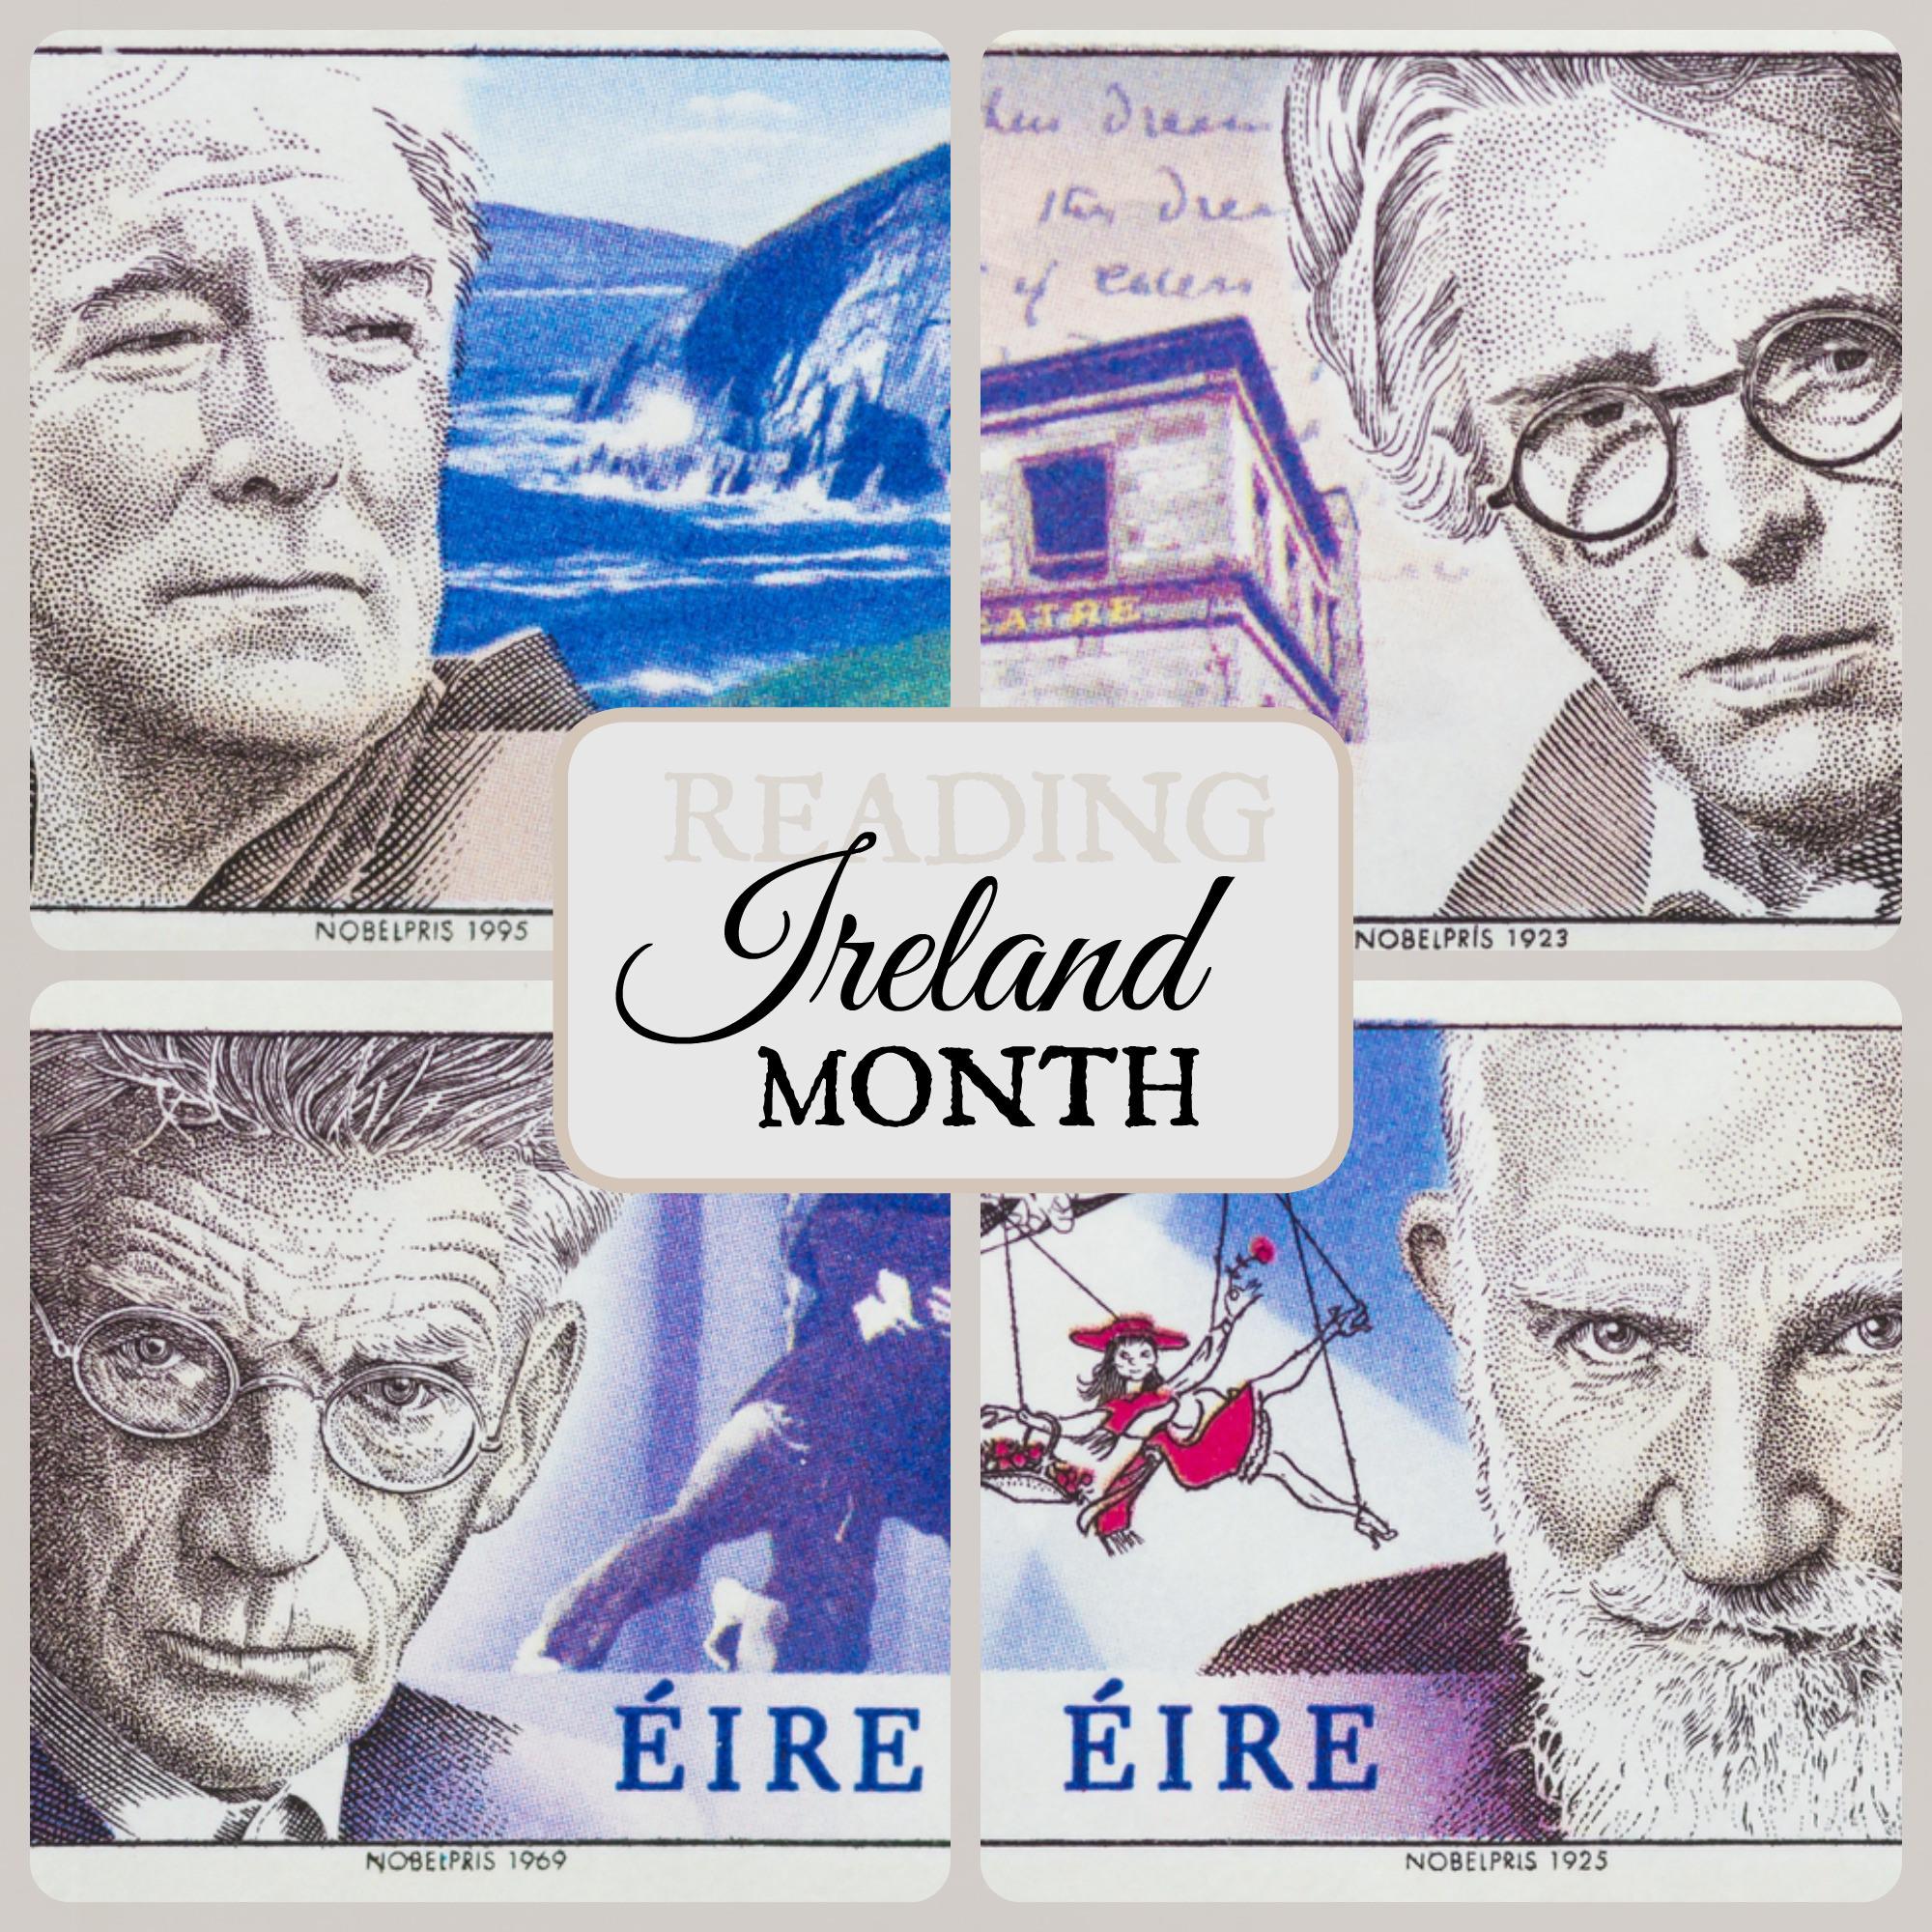 Guardian Columnist Jackie Ashley Ireland Month